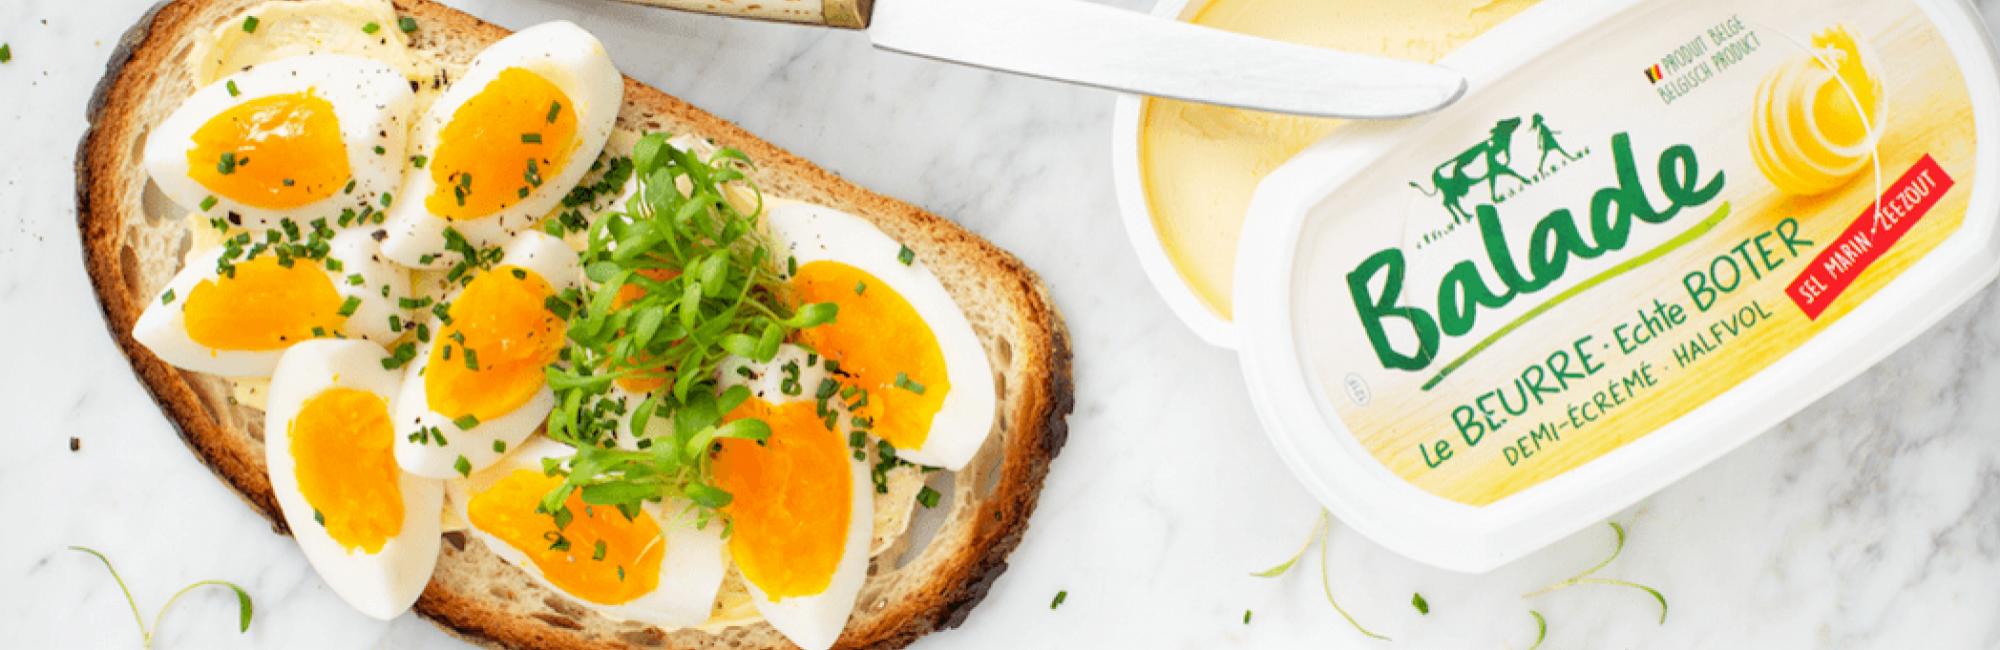 Tartine aux œufs mollets